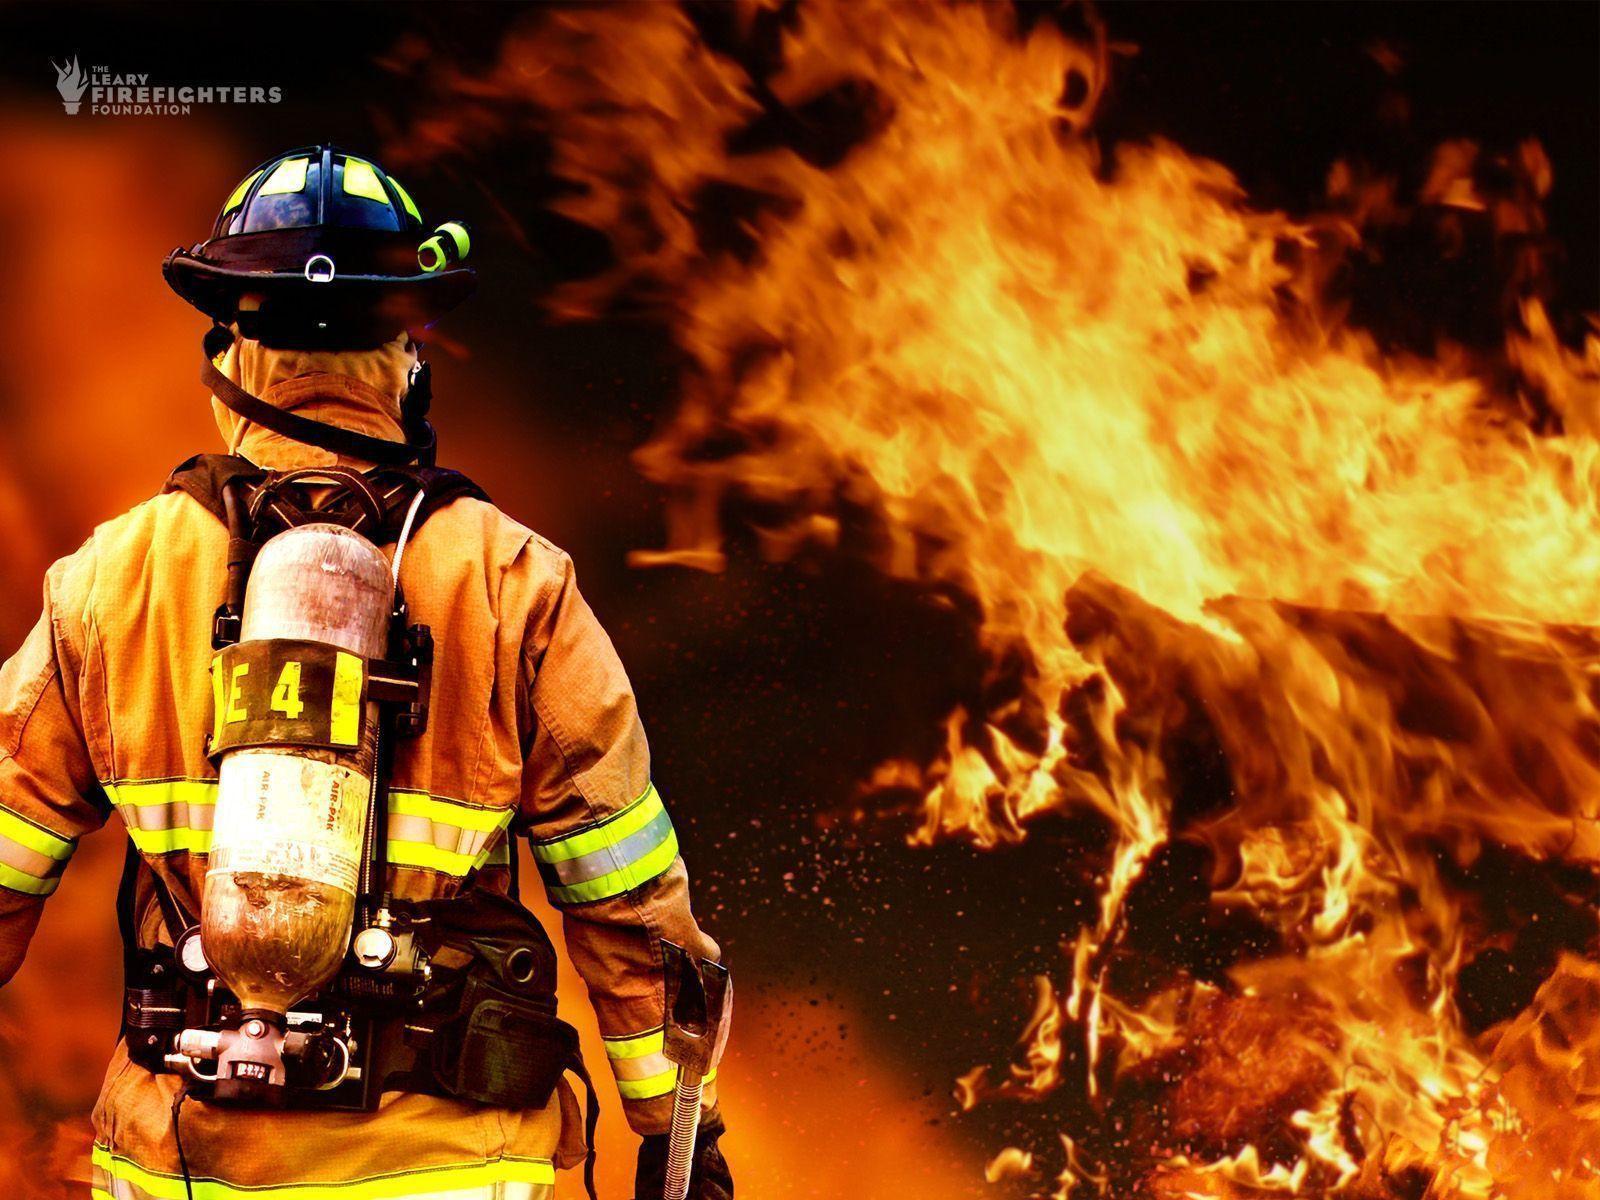 Free Firefighter Wallpapers Desktop Navy Seal